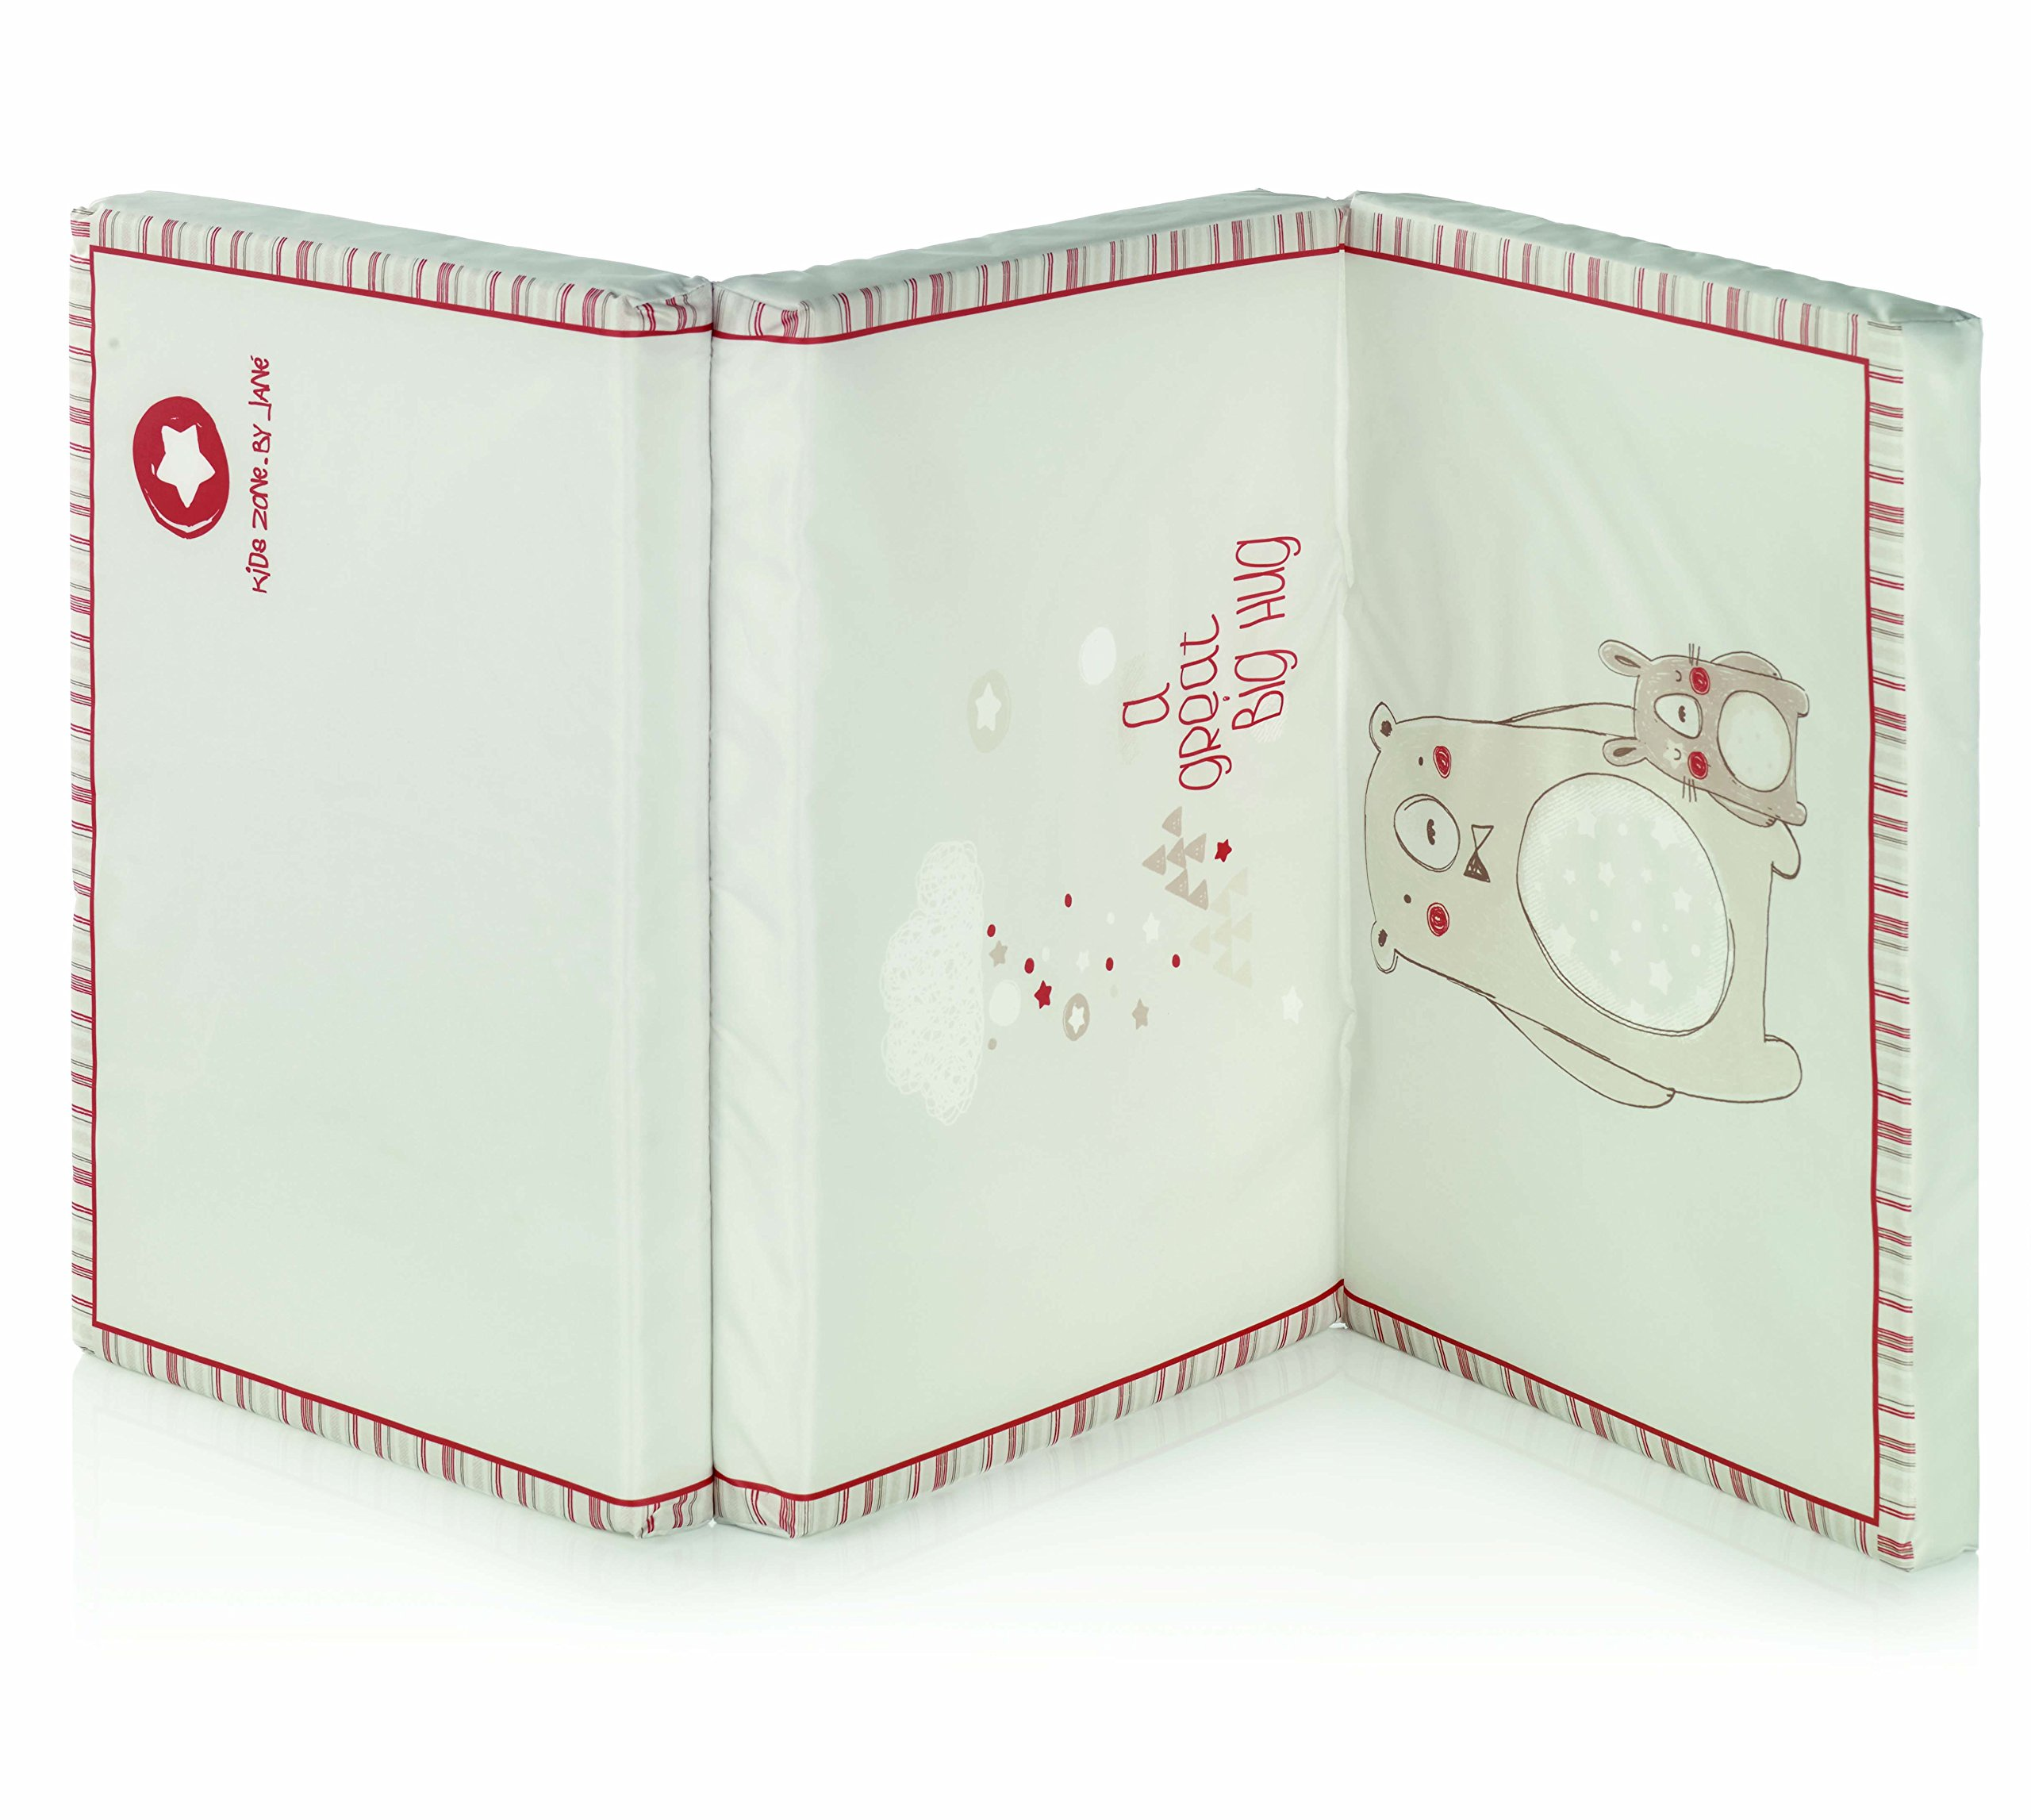 JANE 080255 S18 - Colchón para cuna de viaje, unisex product image